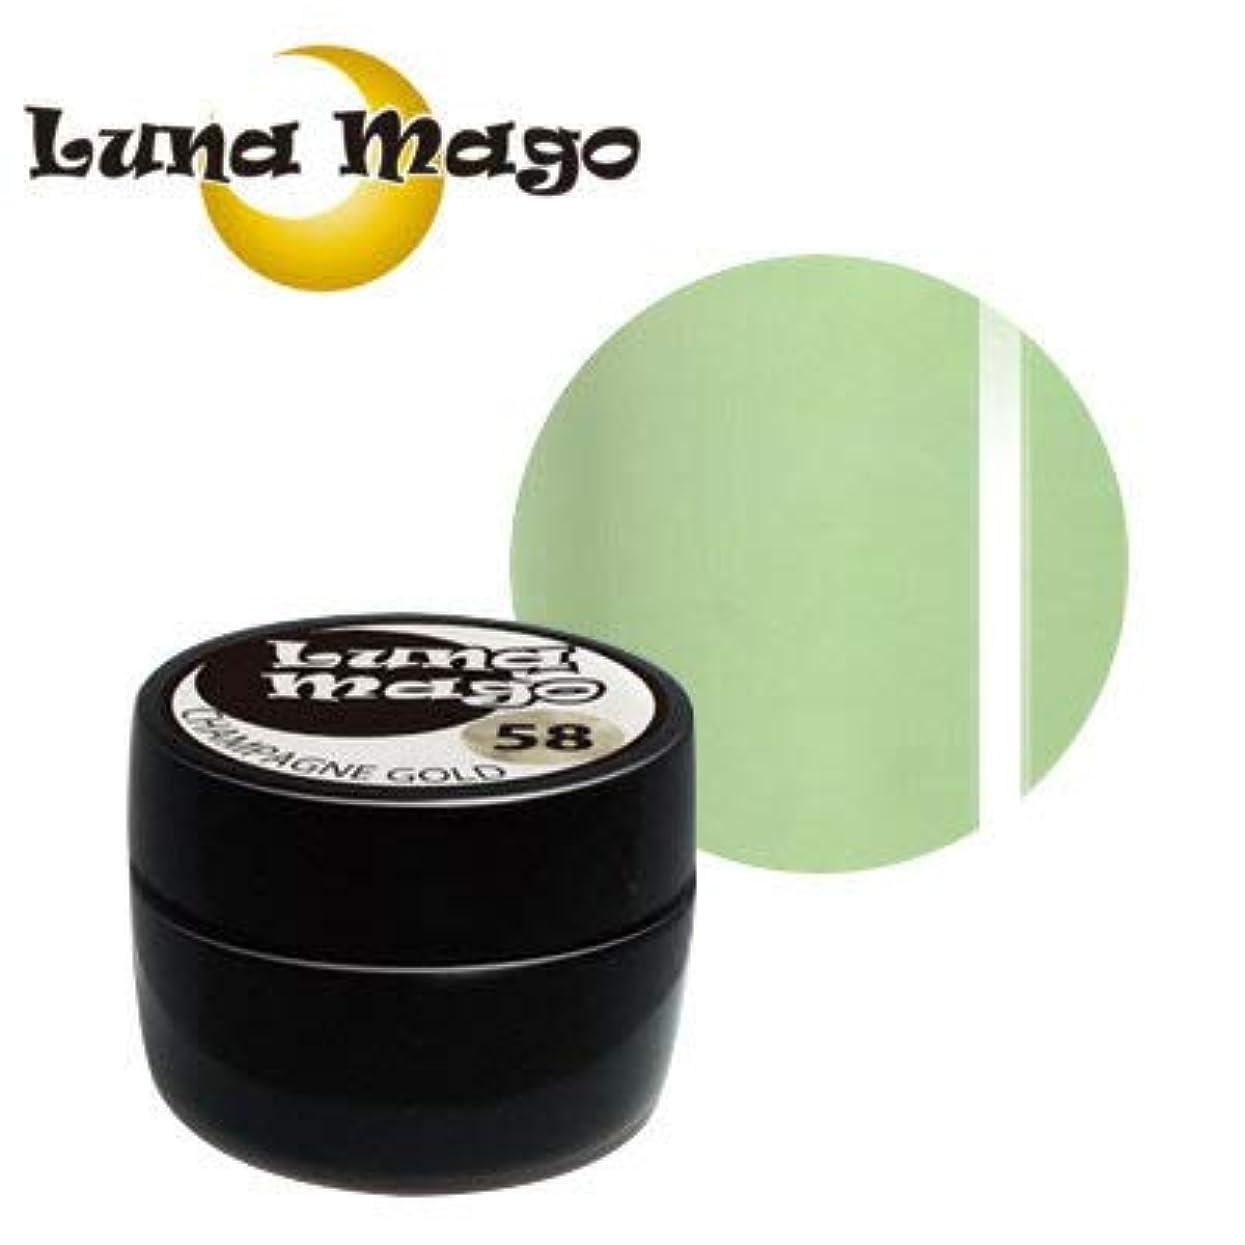 Luna Mago カラージェル 5g 037 グリーンティラテ